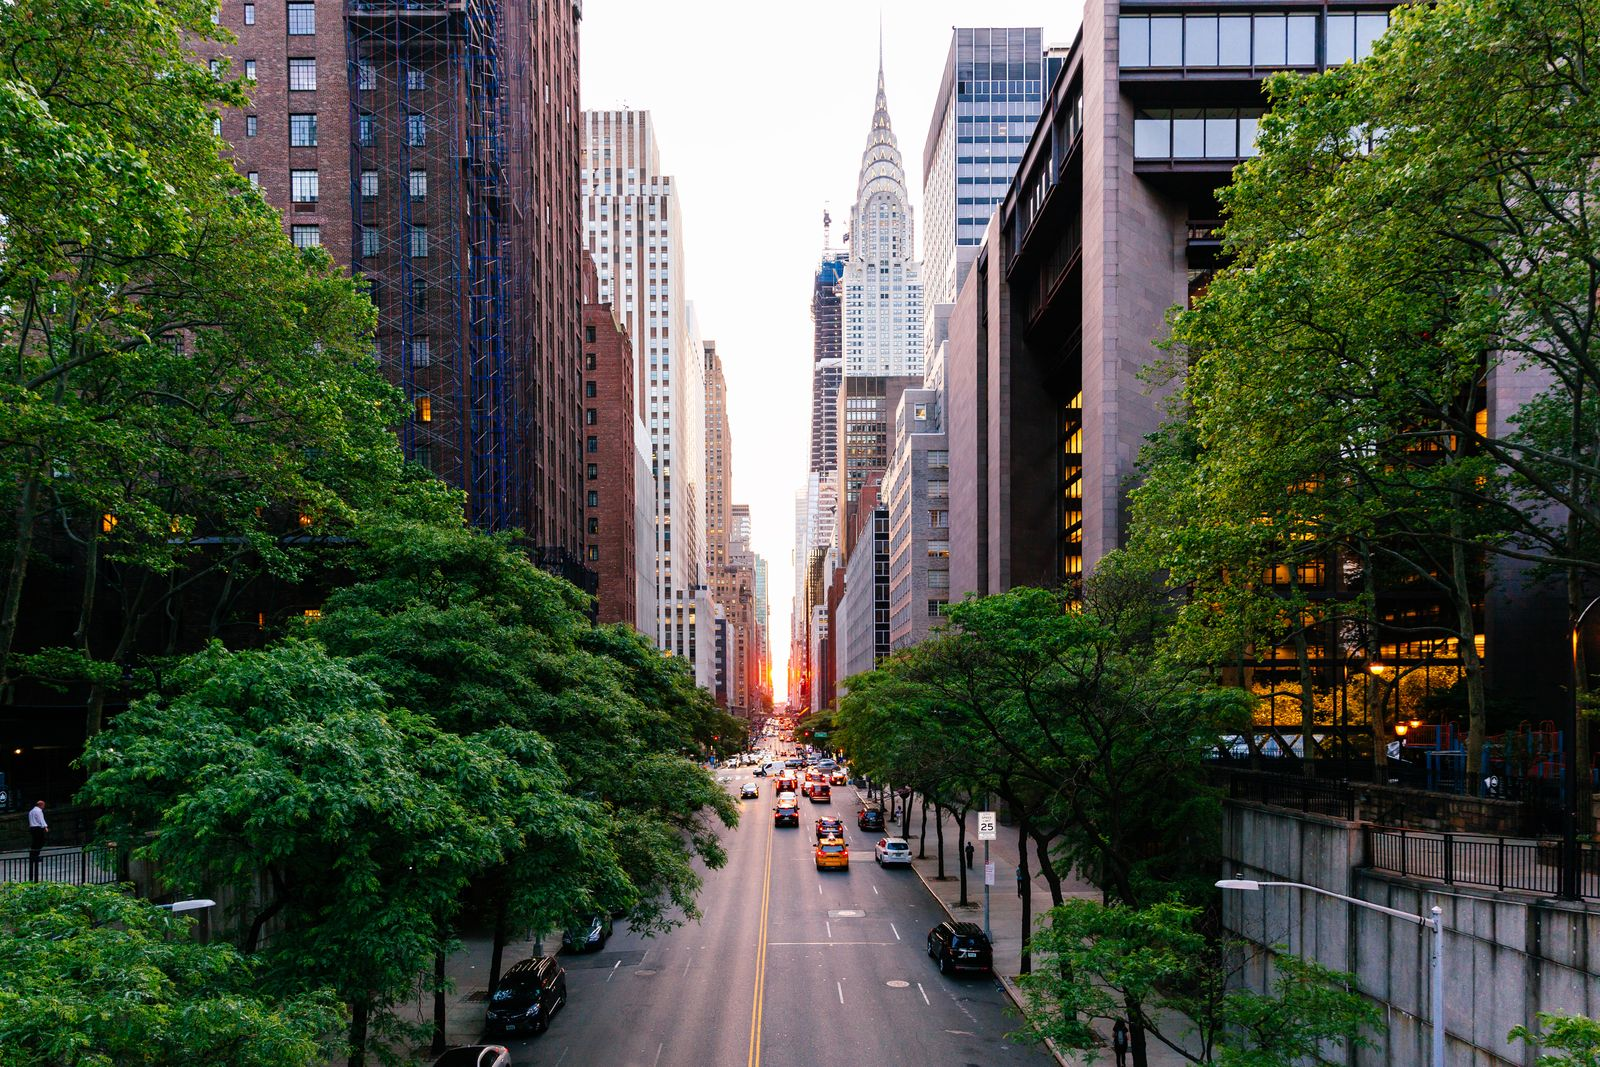 Manhattanhenge seen on 42nd street in New York City, USA